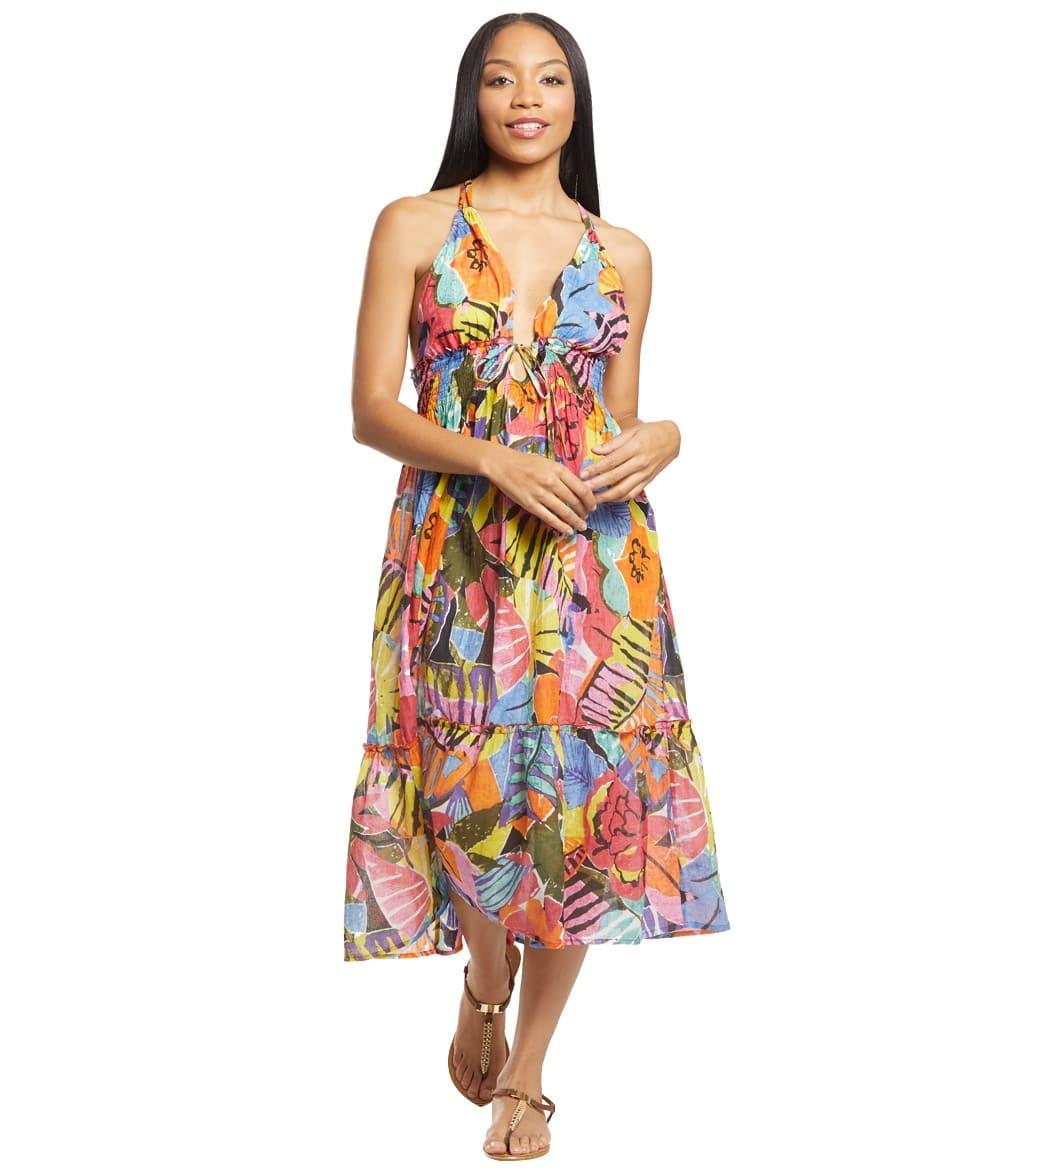 Floral Batik Ralph Cover Up Midi Dress Lauren Polo QxhBsCtrd